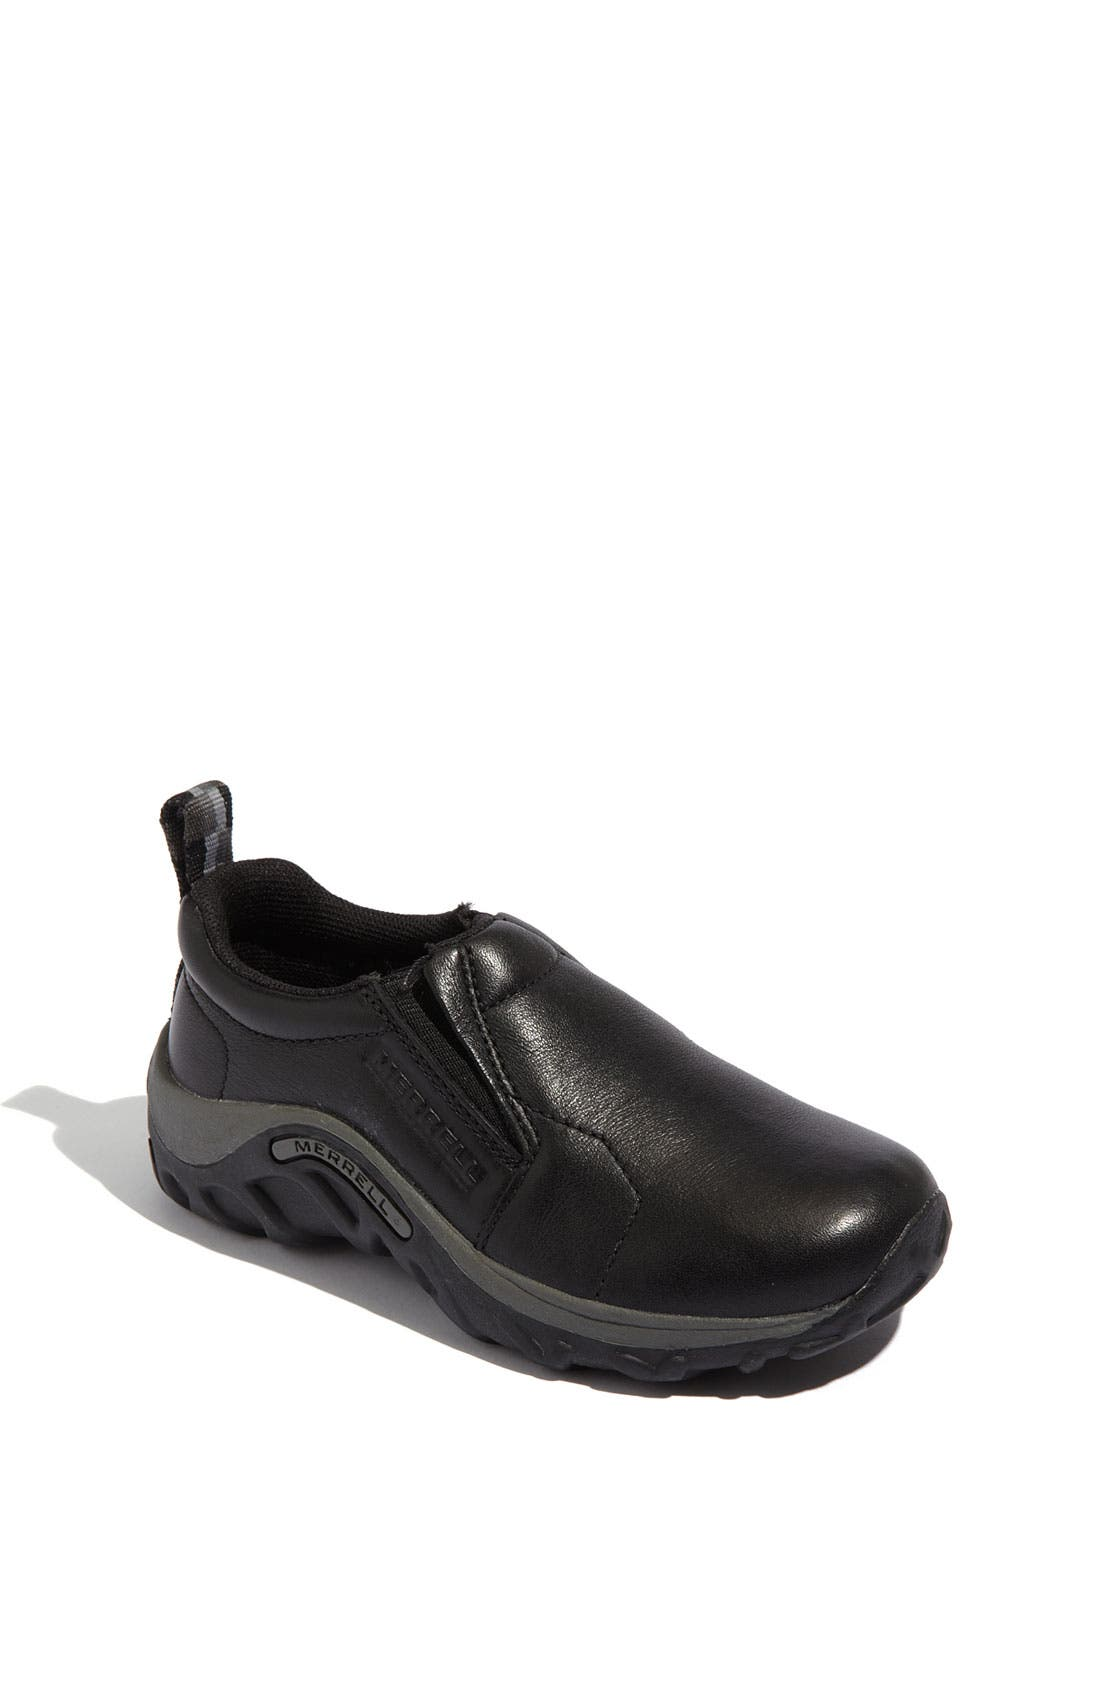 MERRELL 'Jungle Moc' Leather Slip-On, Main, color, 001